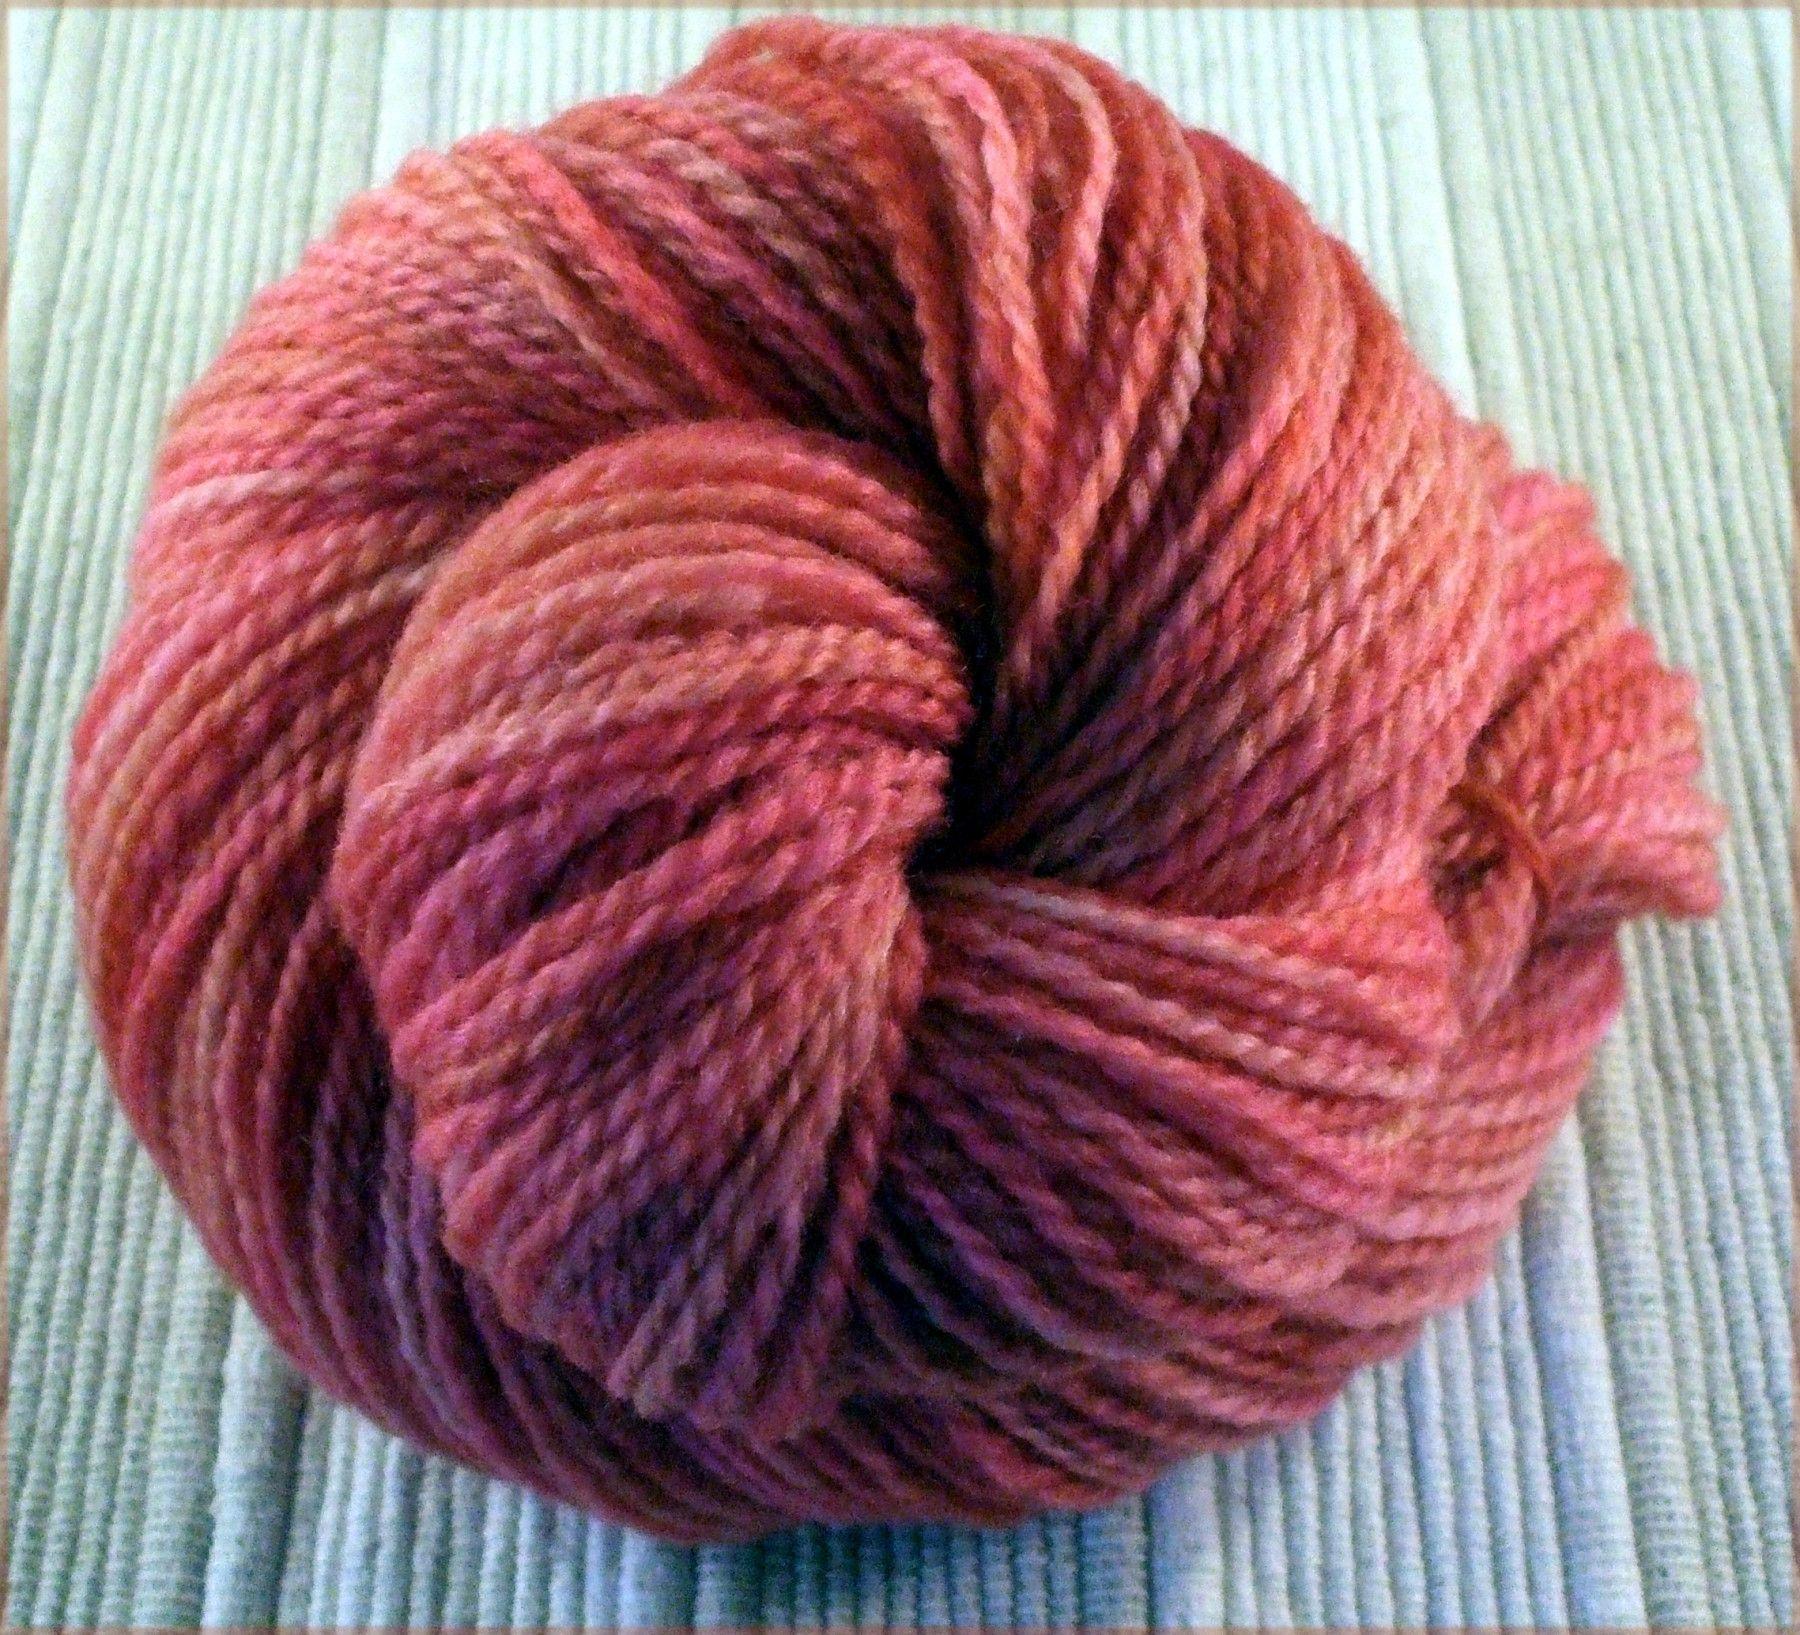 Homespun Heirloom Yarns Handspun Falkland Wool Sport Weight Yarn Sport Weight Yarn Handspun Yarn